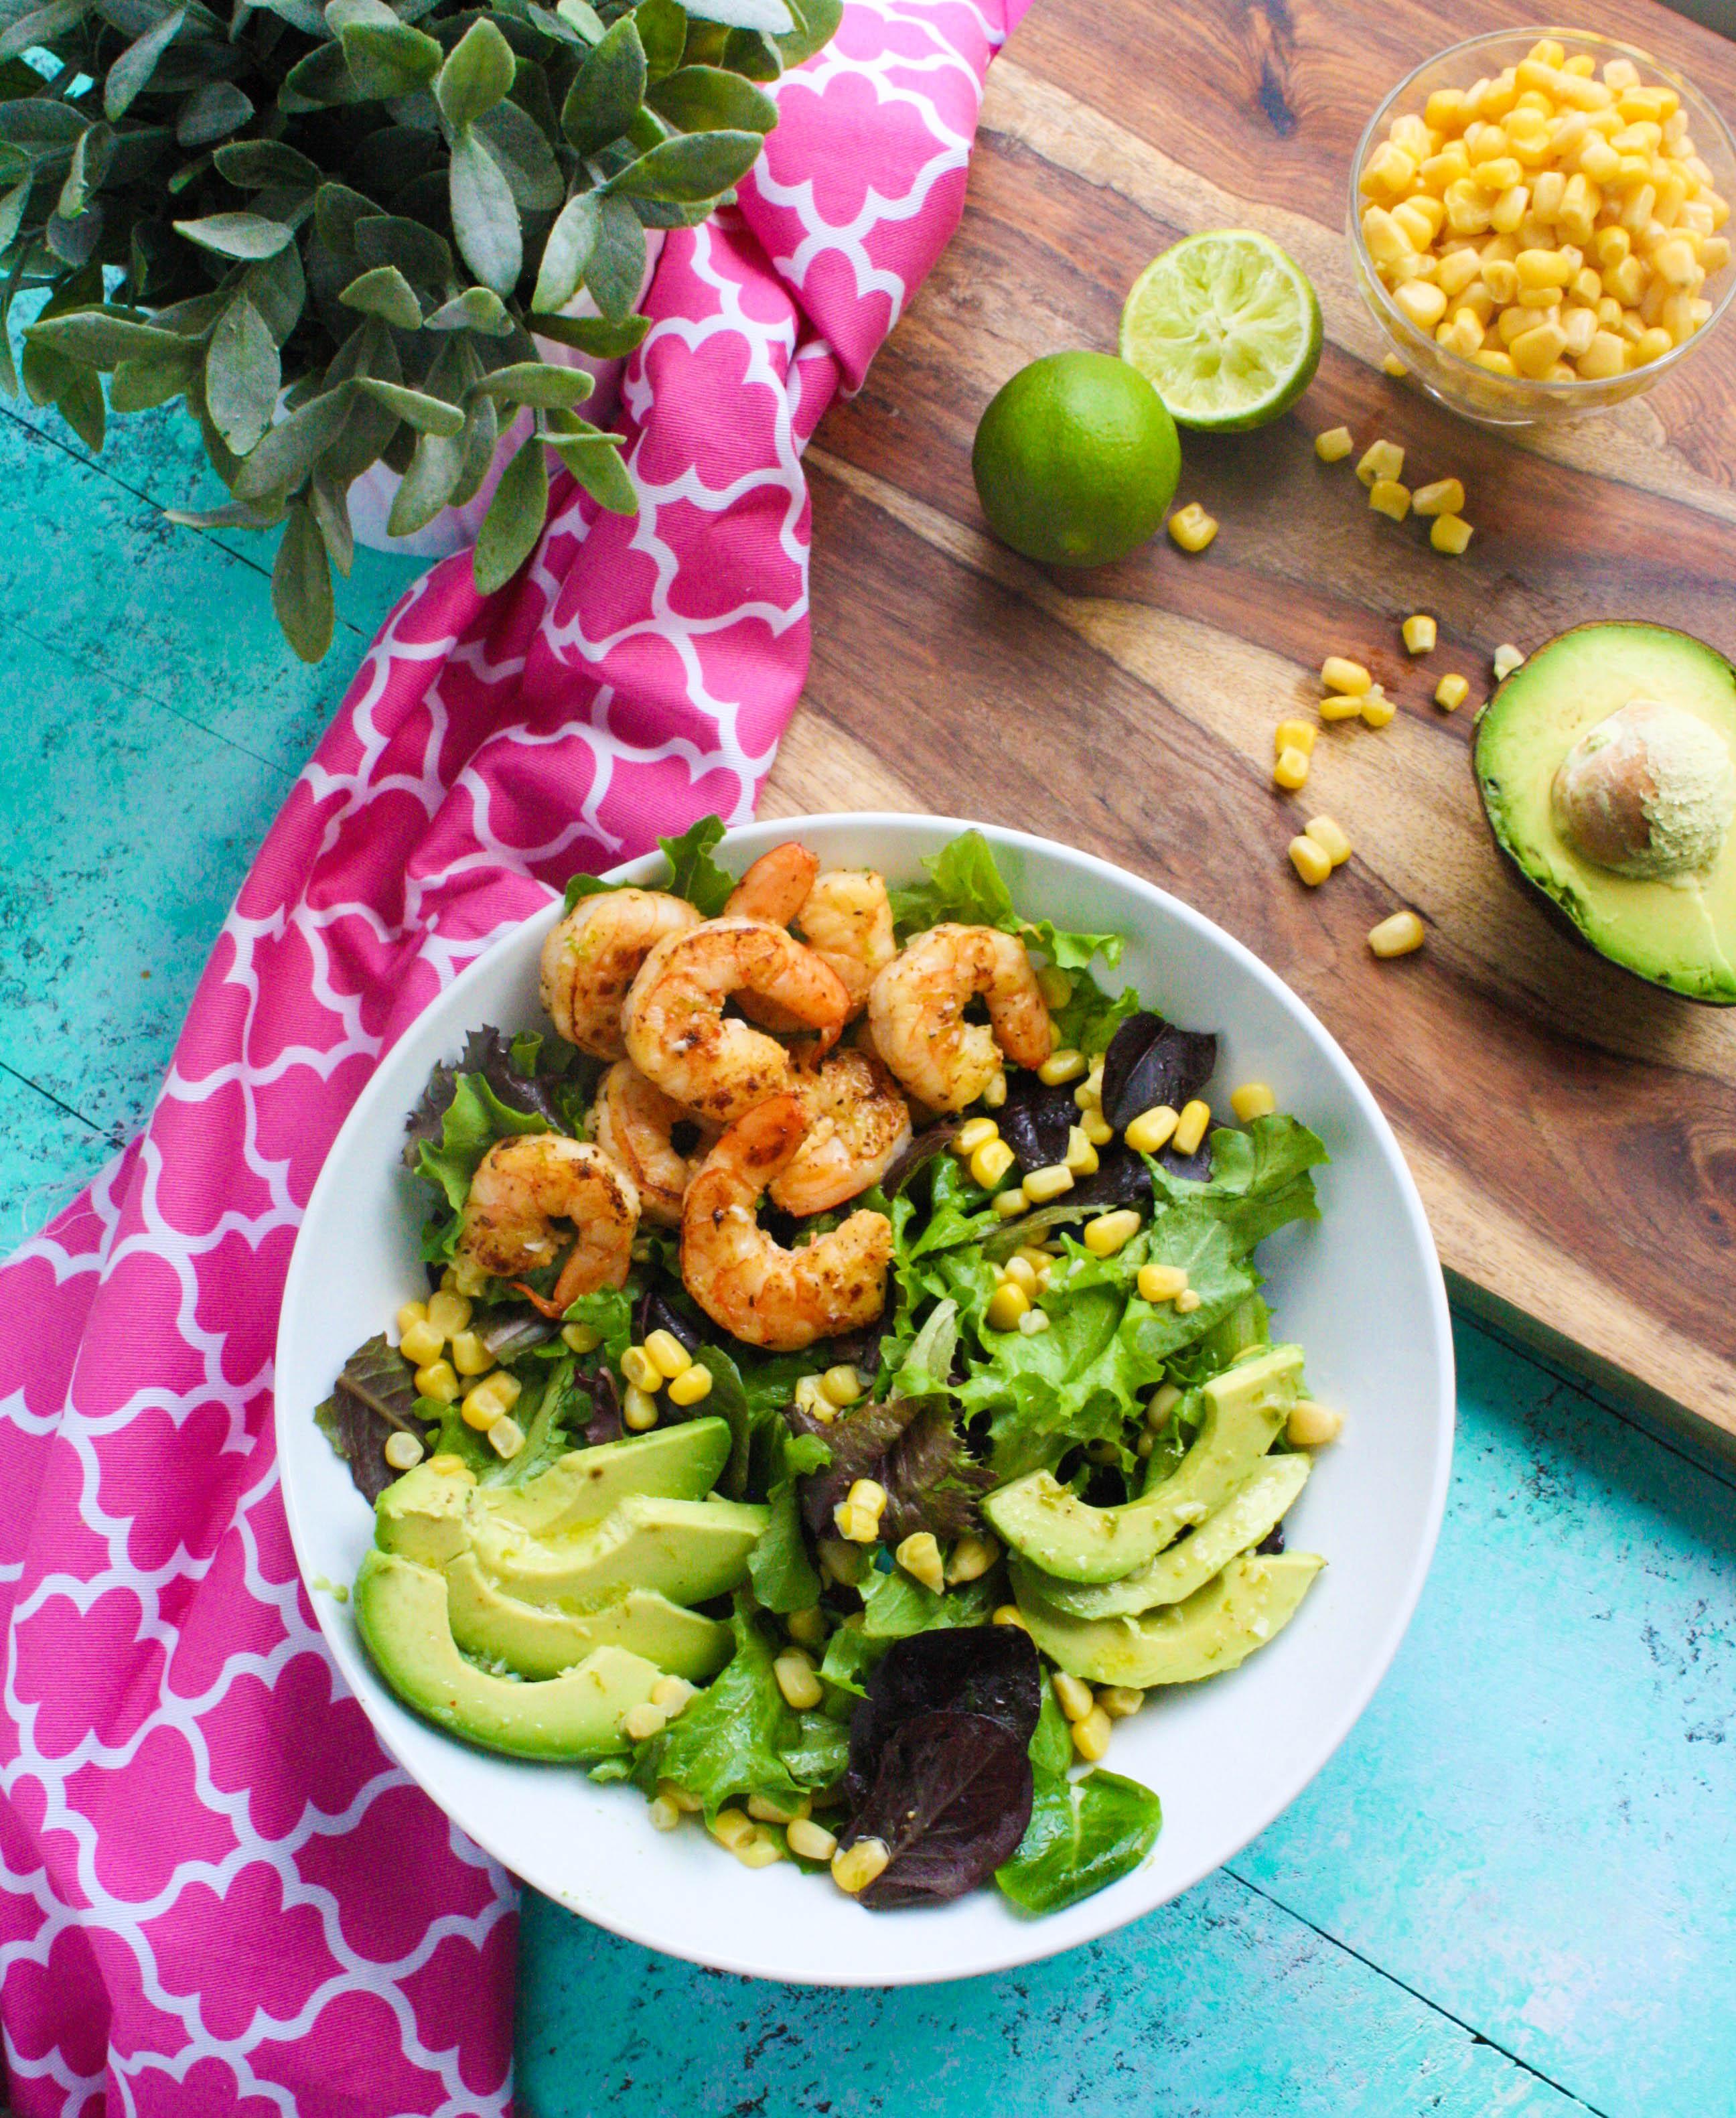 Simple Skillet Shrimp Salad with Lime Vinaigrette is so easy to toss together. Simple Skillet Shrimp Salad with Lime Vinaigrette is a treat for mealtime!